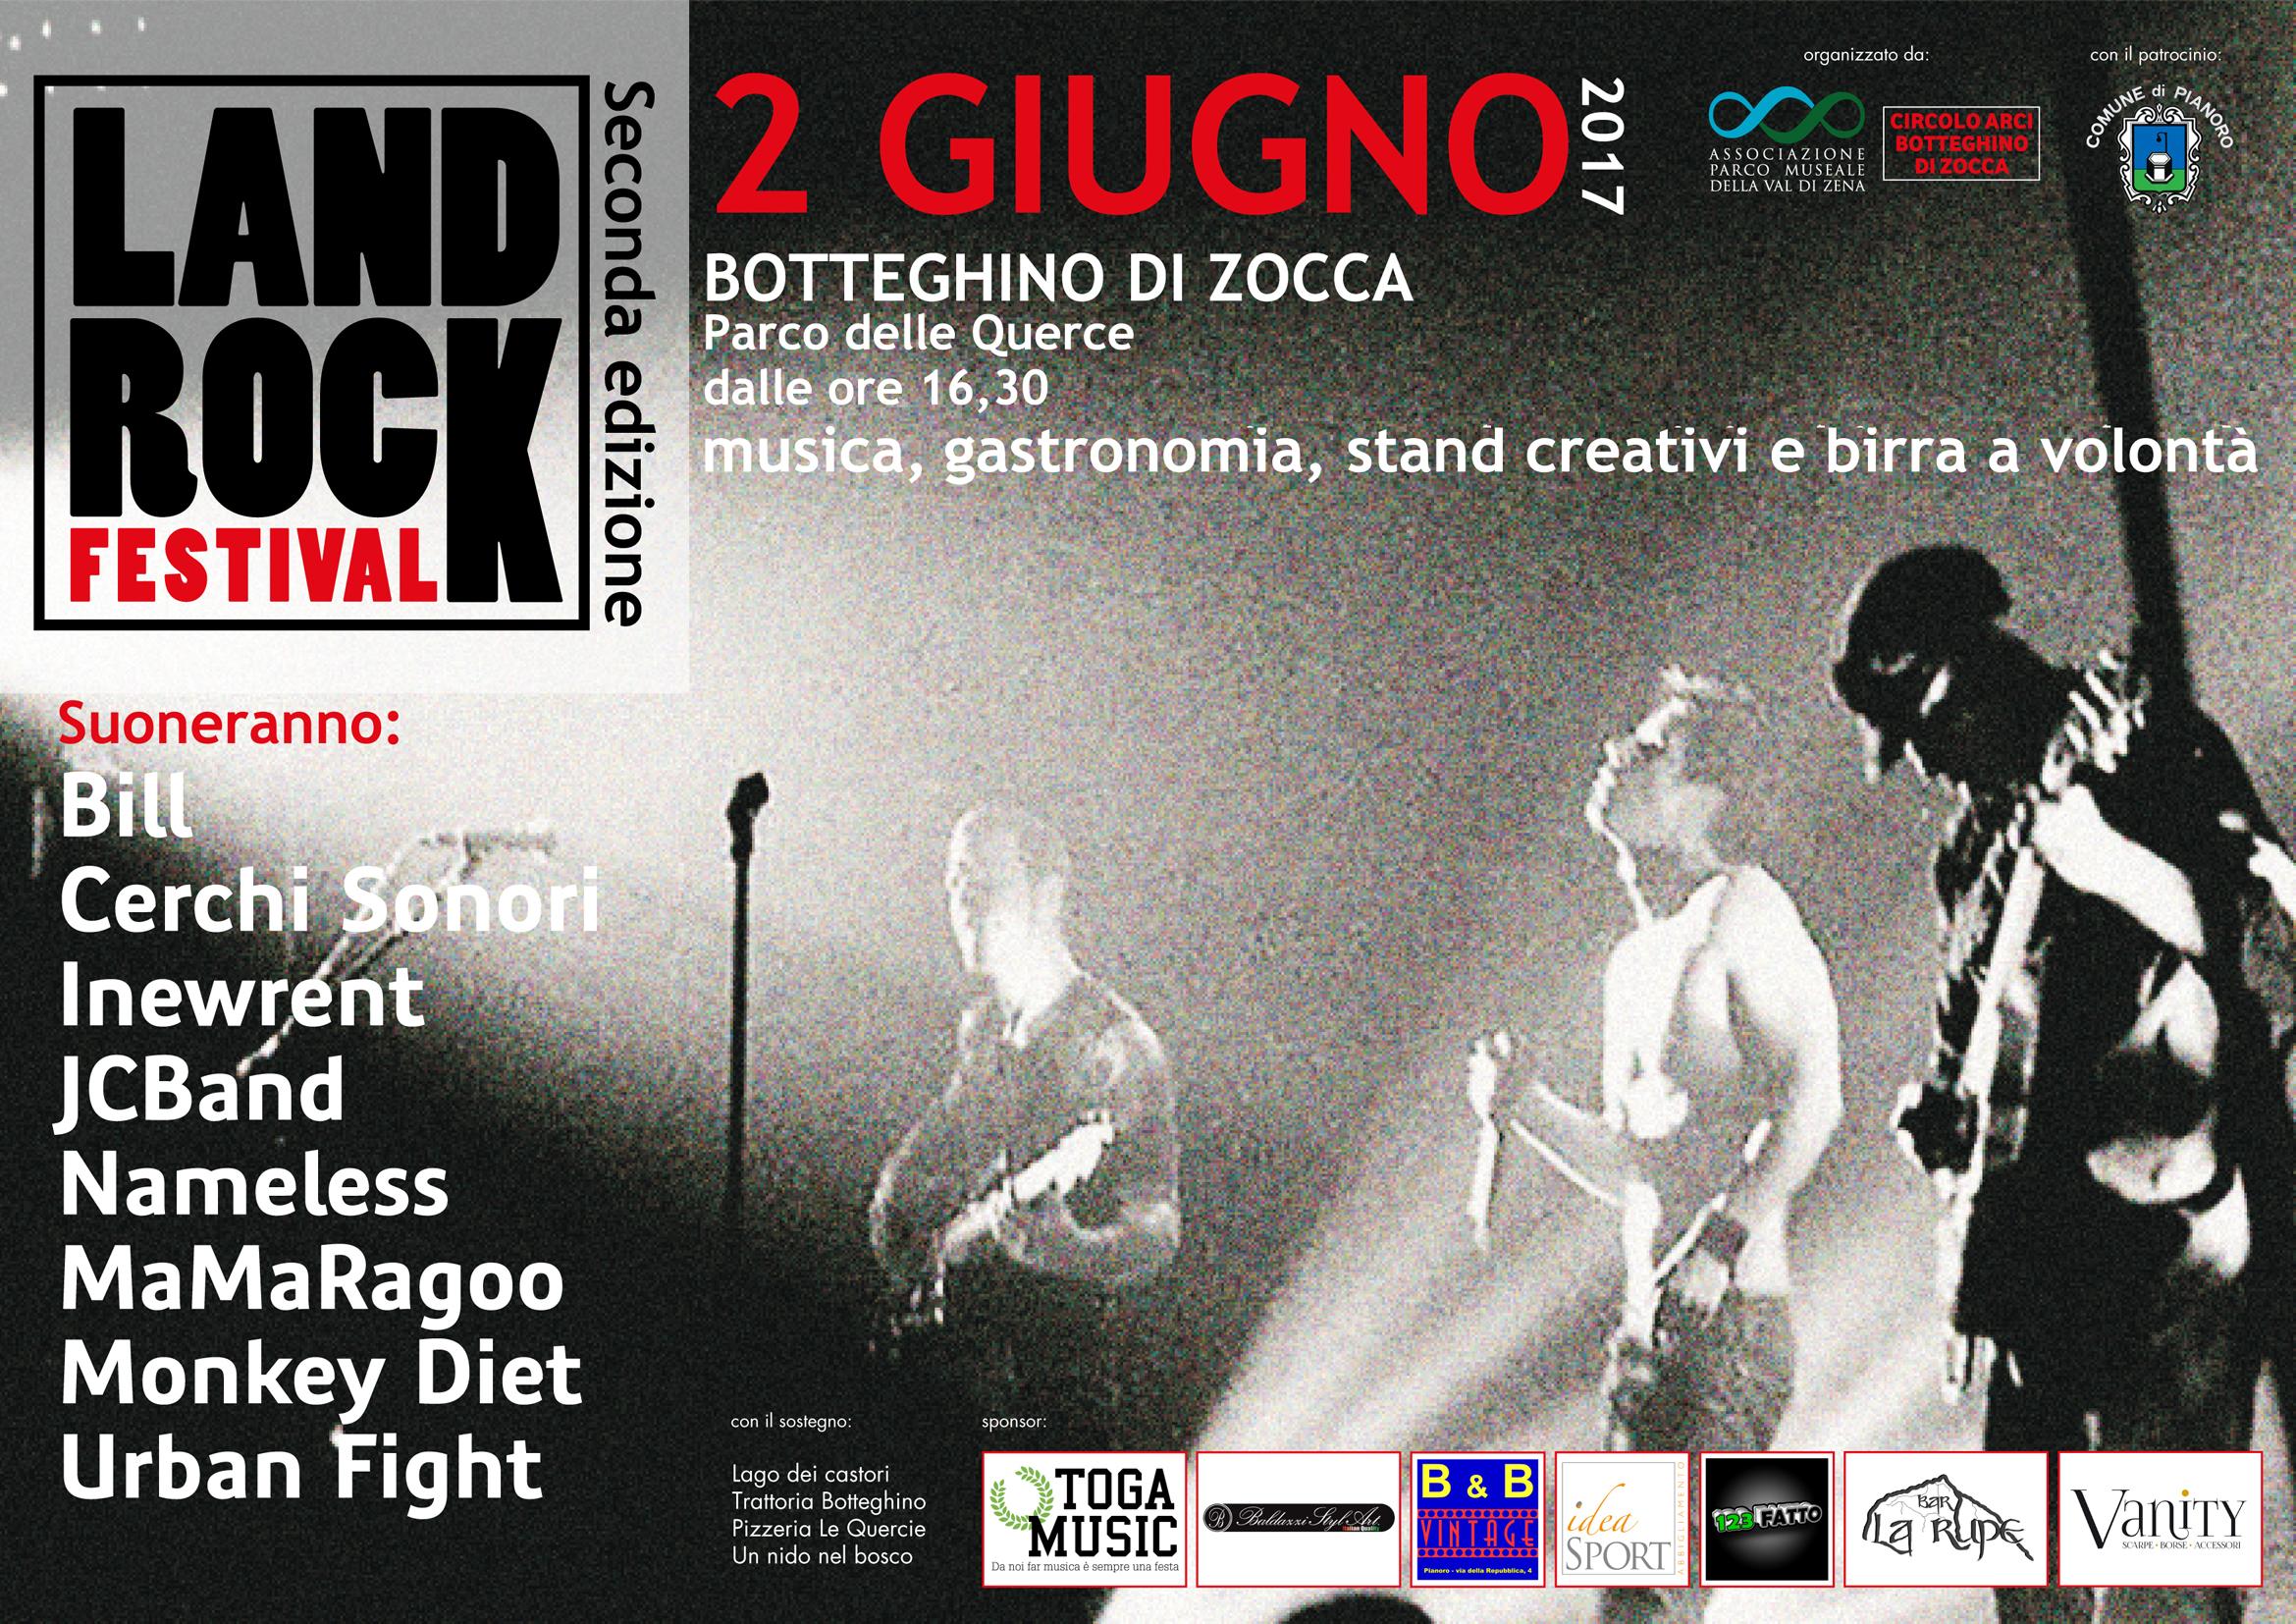 Land Rock Festival